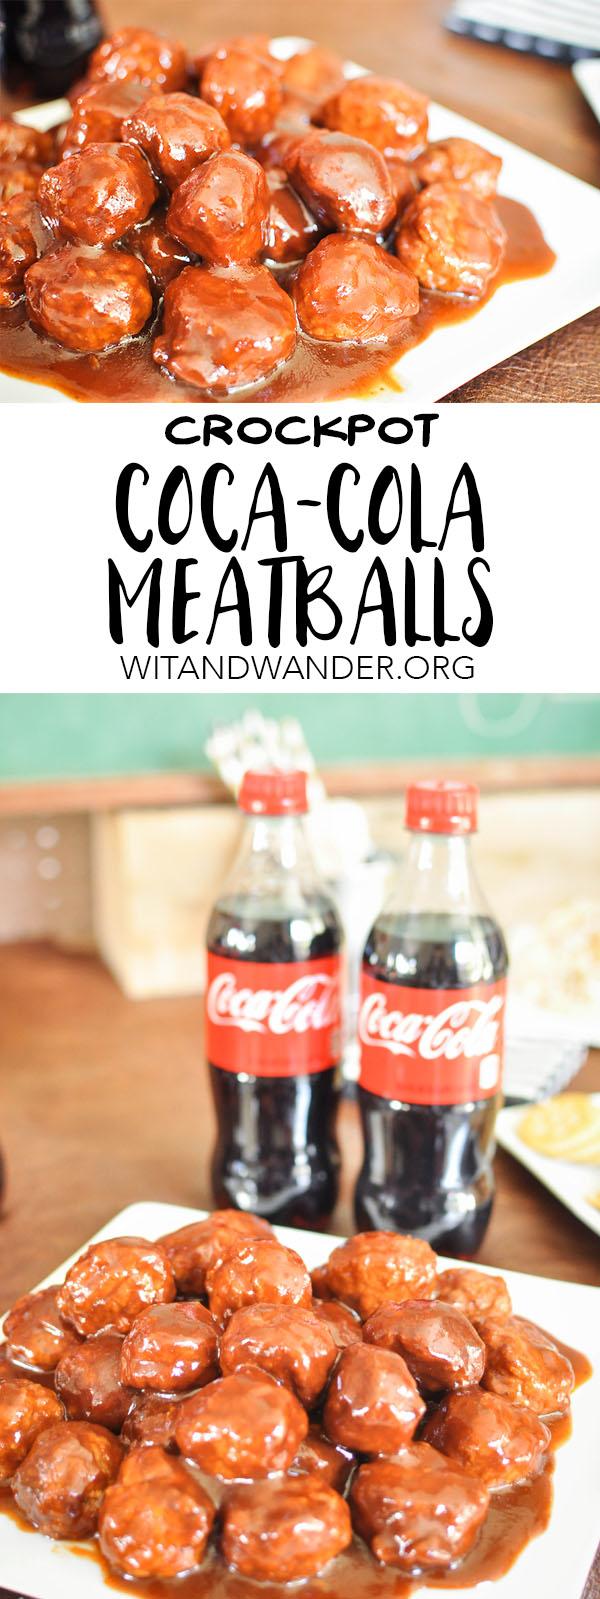 Crockpot Coca-Cola Meatballs - Wit & Wander Pinterest